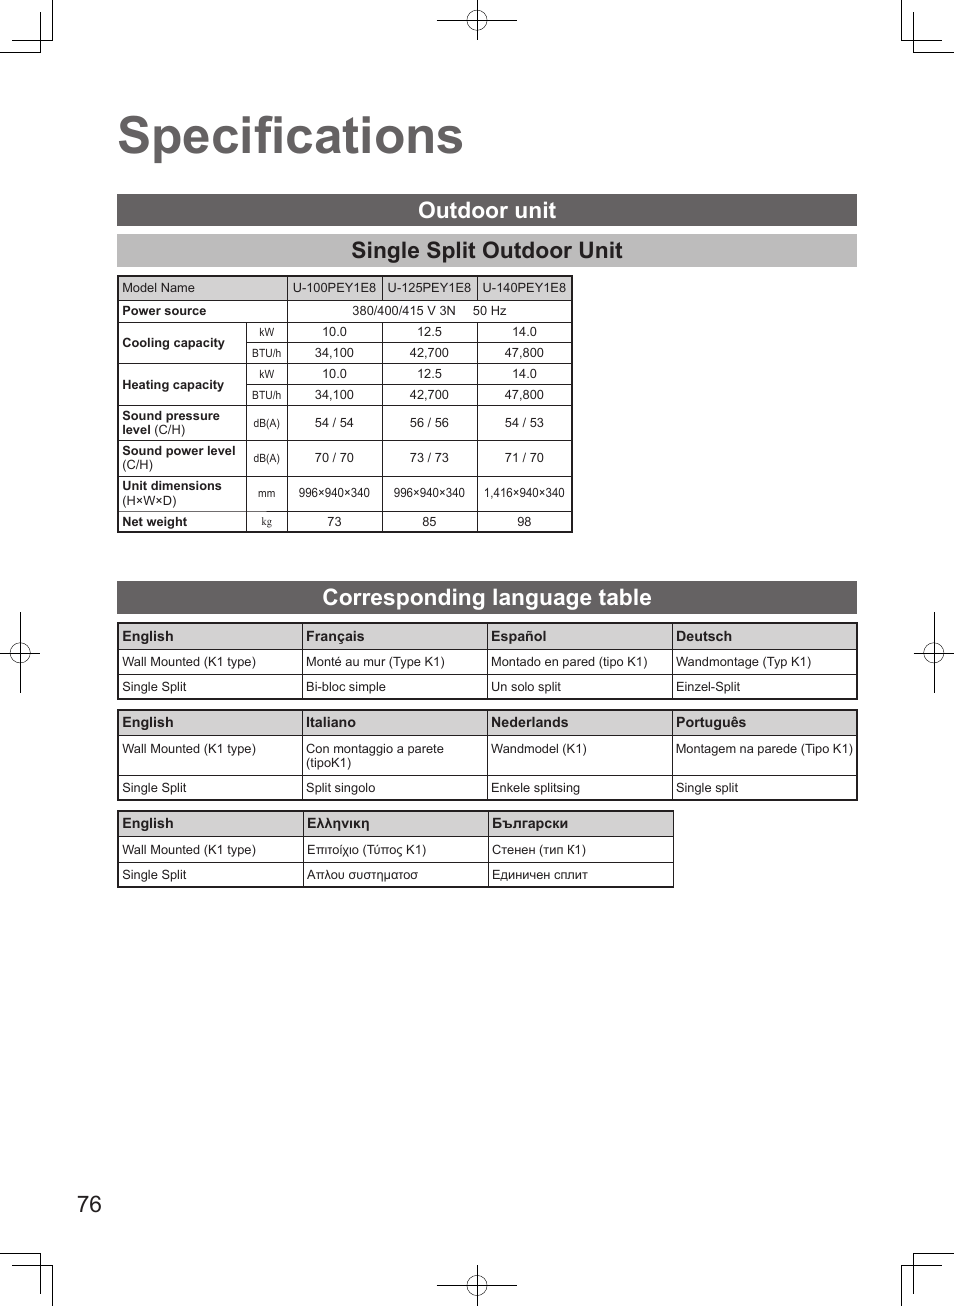 Specifi cations, Single split outdoor unit, Corresponding